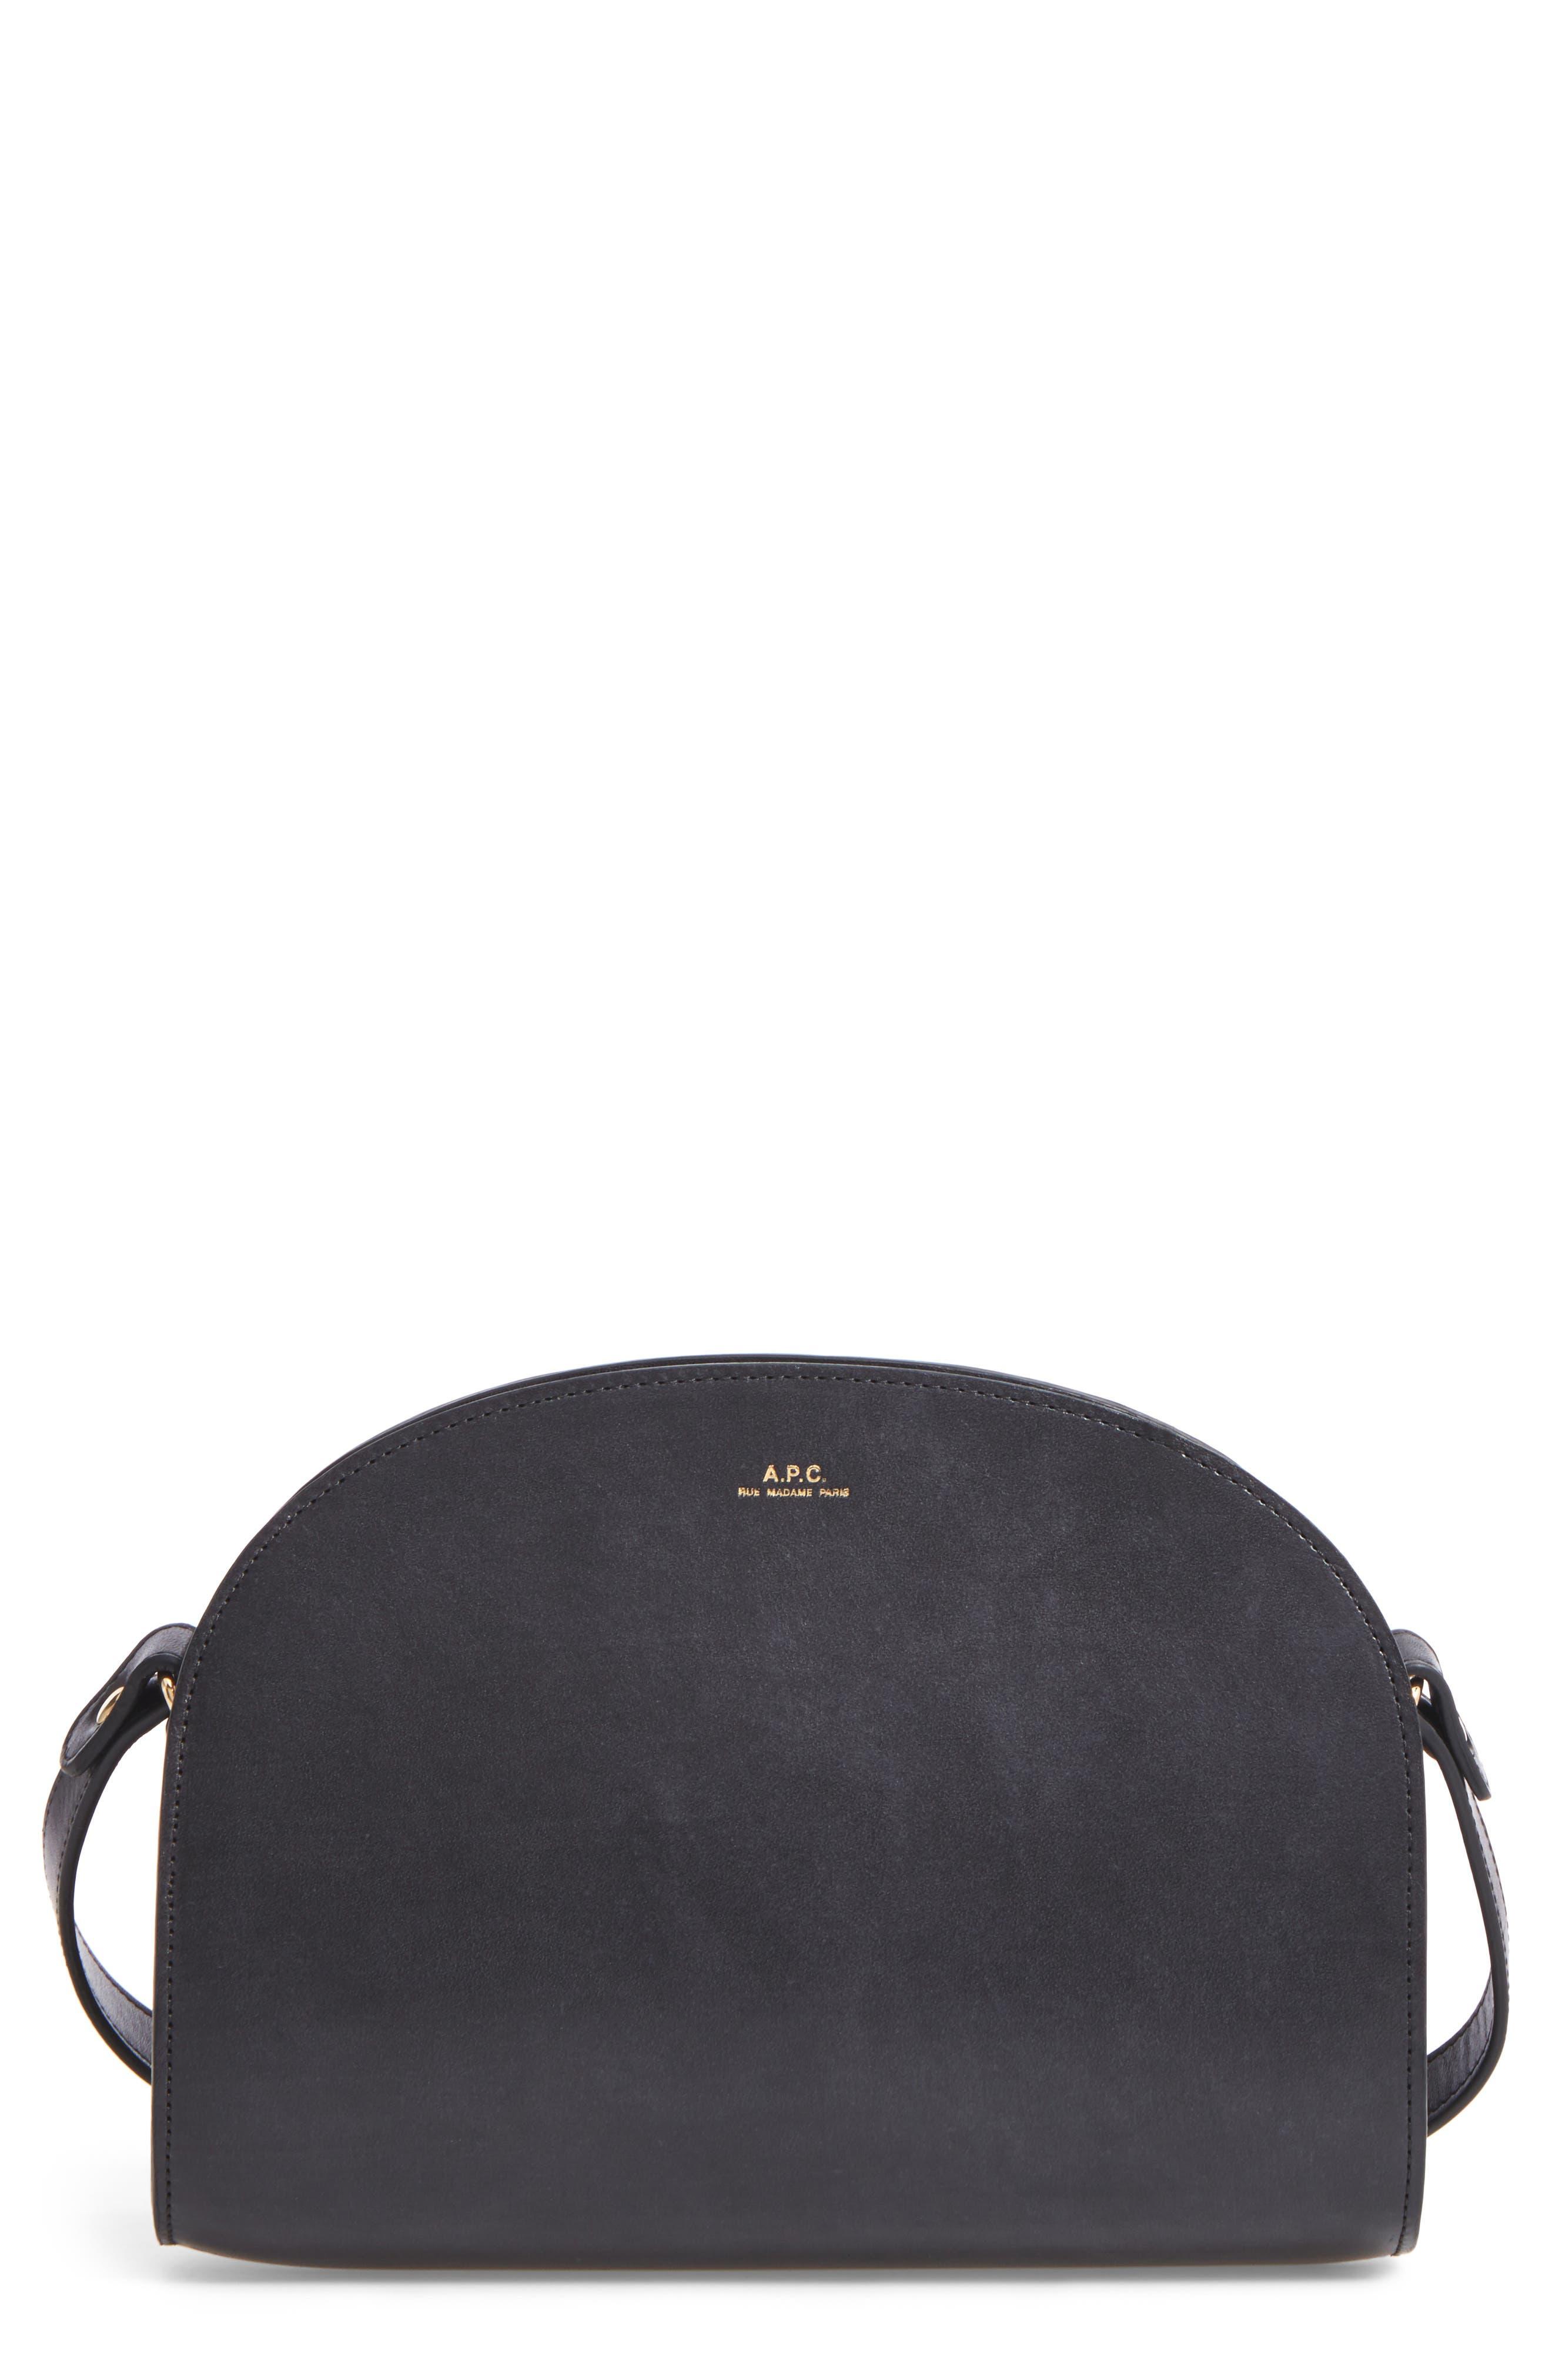 Sac Demi Lune Leather Crossbody Bag,                             Main thumbnail 1, color,                             001